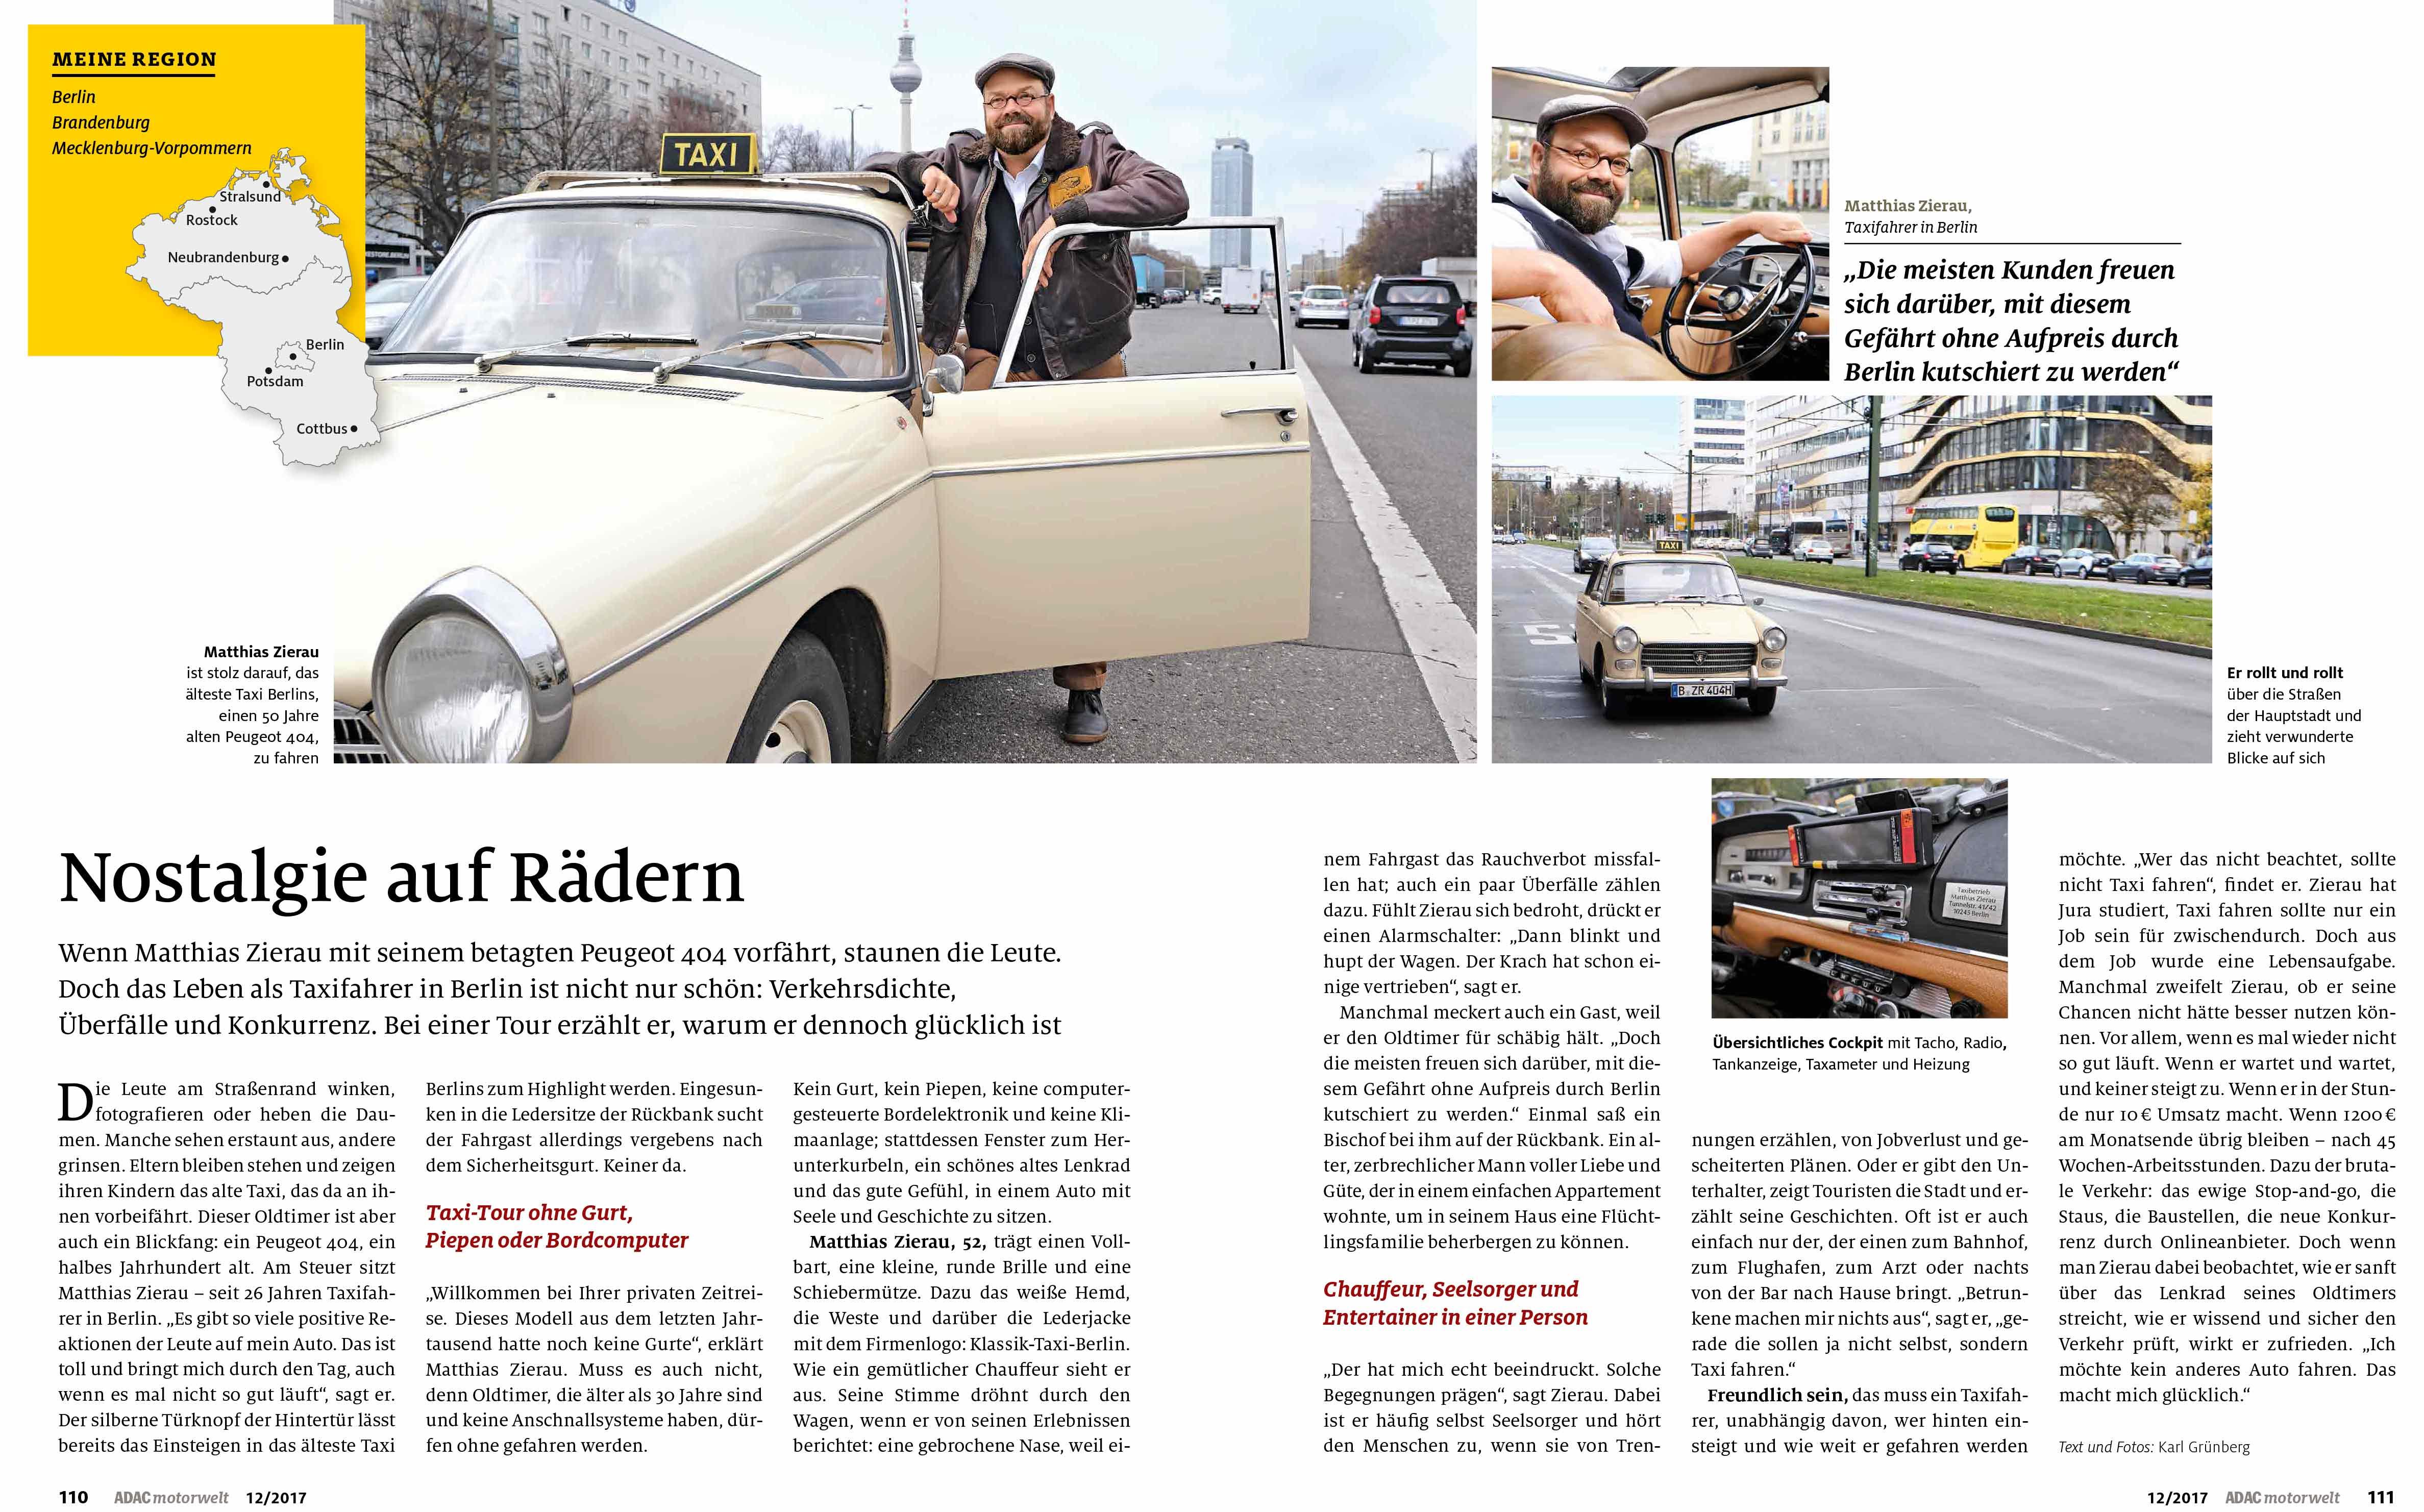 Oldi-Taxi-Berlin, Reportage Karl Grünberg